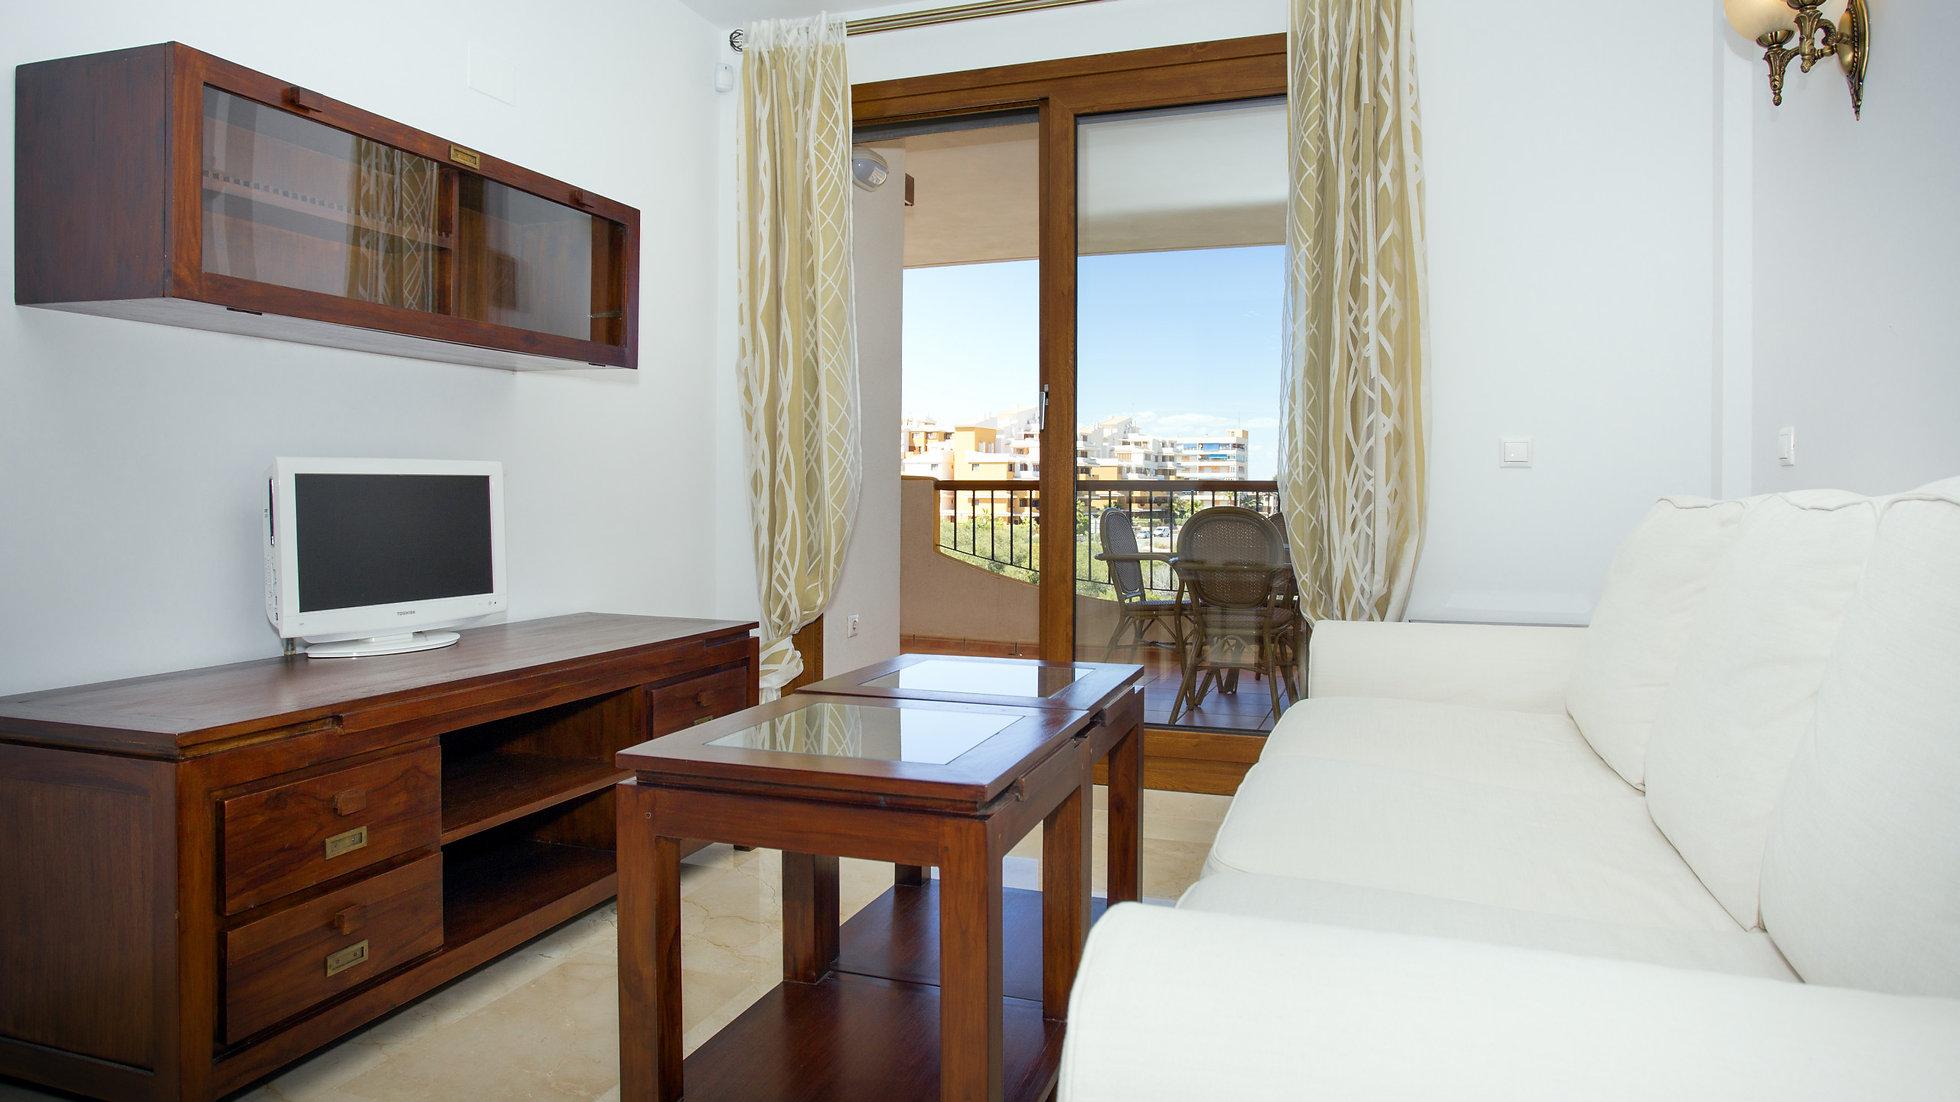 2 Bed Apartment for Long Term Rental in Punta Prima ...